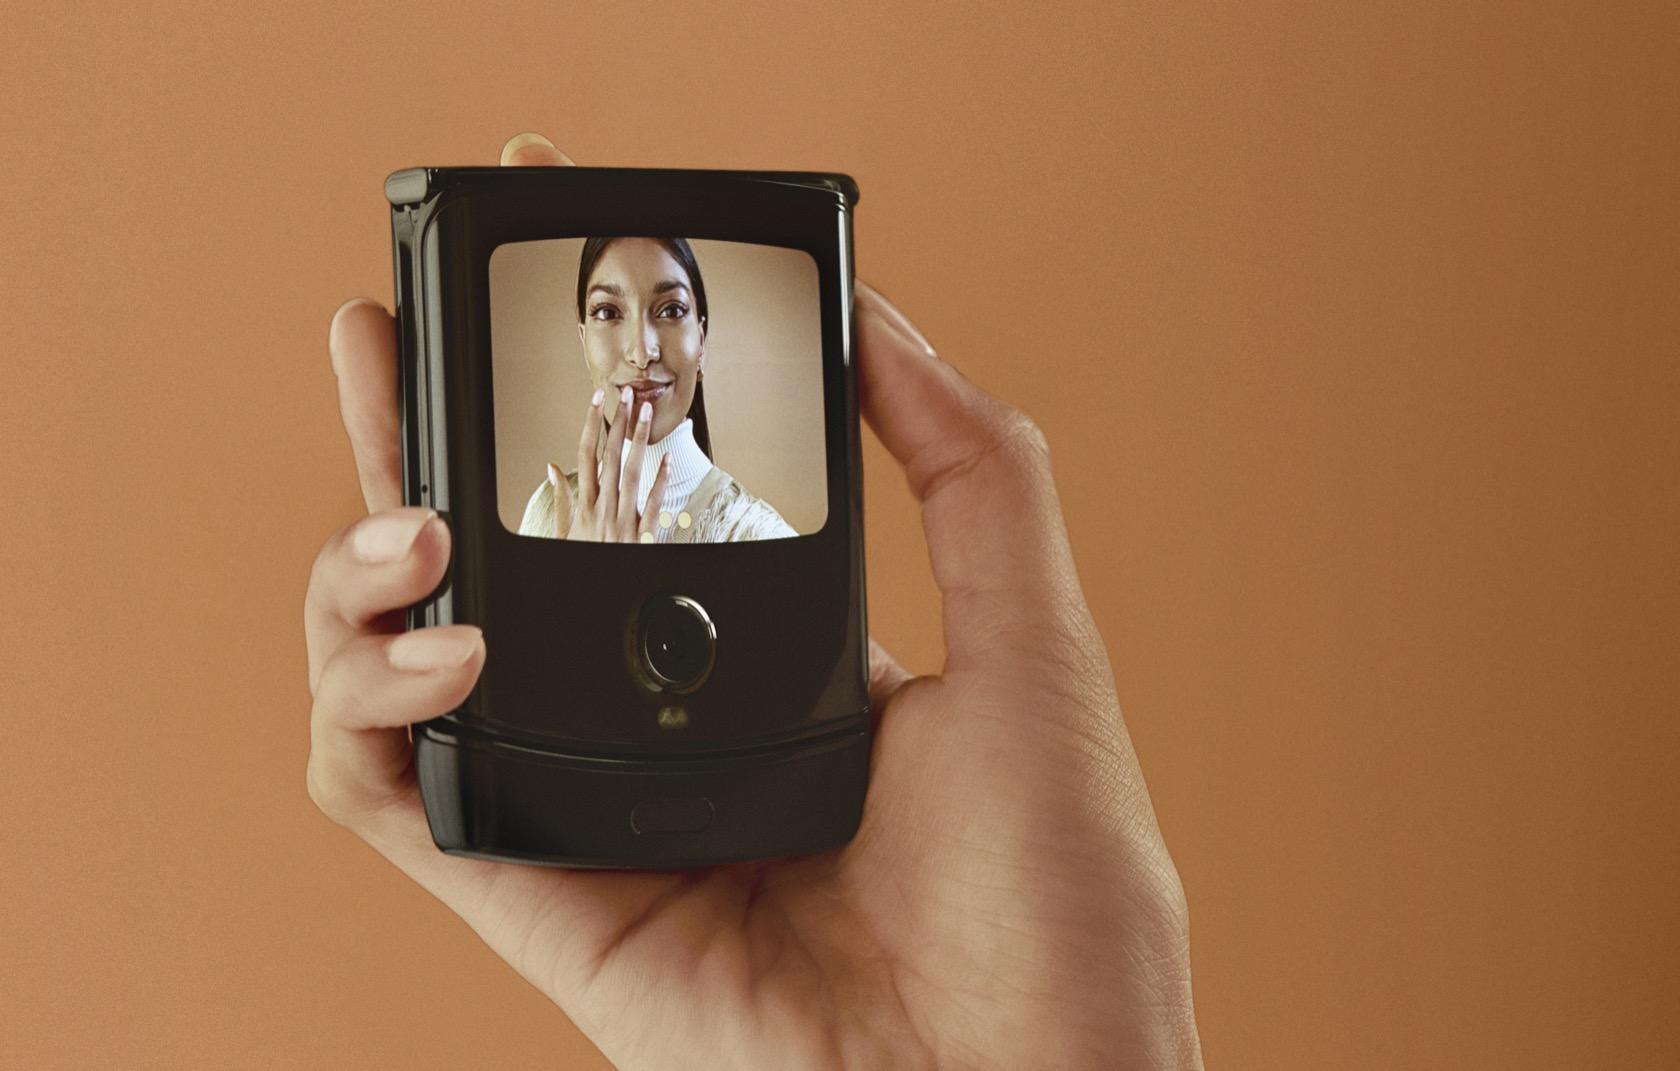 摩托罗拉Razr宣告重生 – 一台折叠屏Android手机的照片 - 7